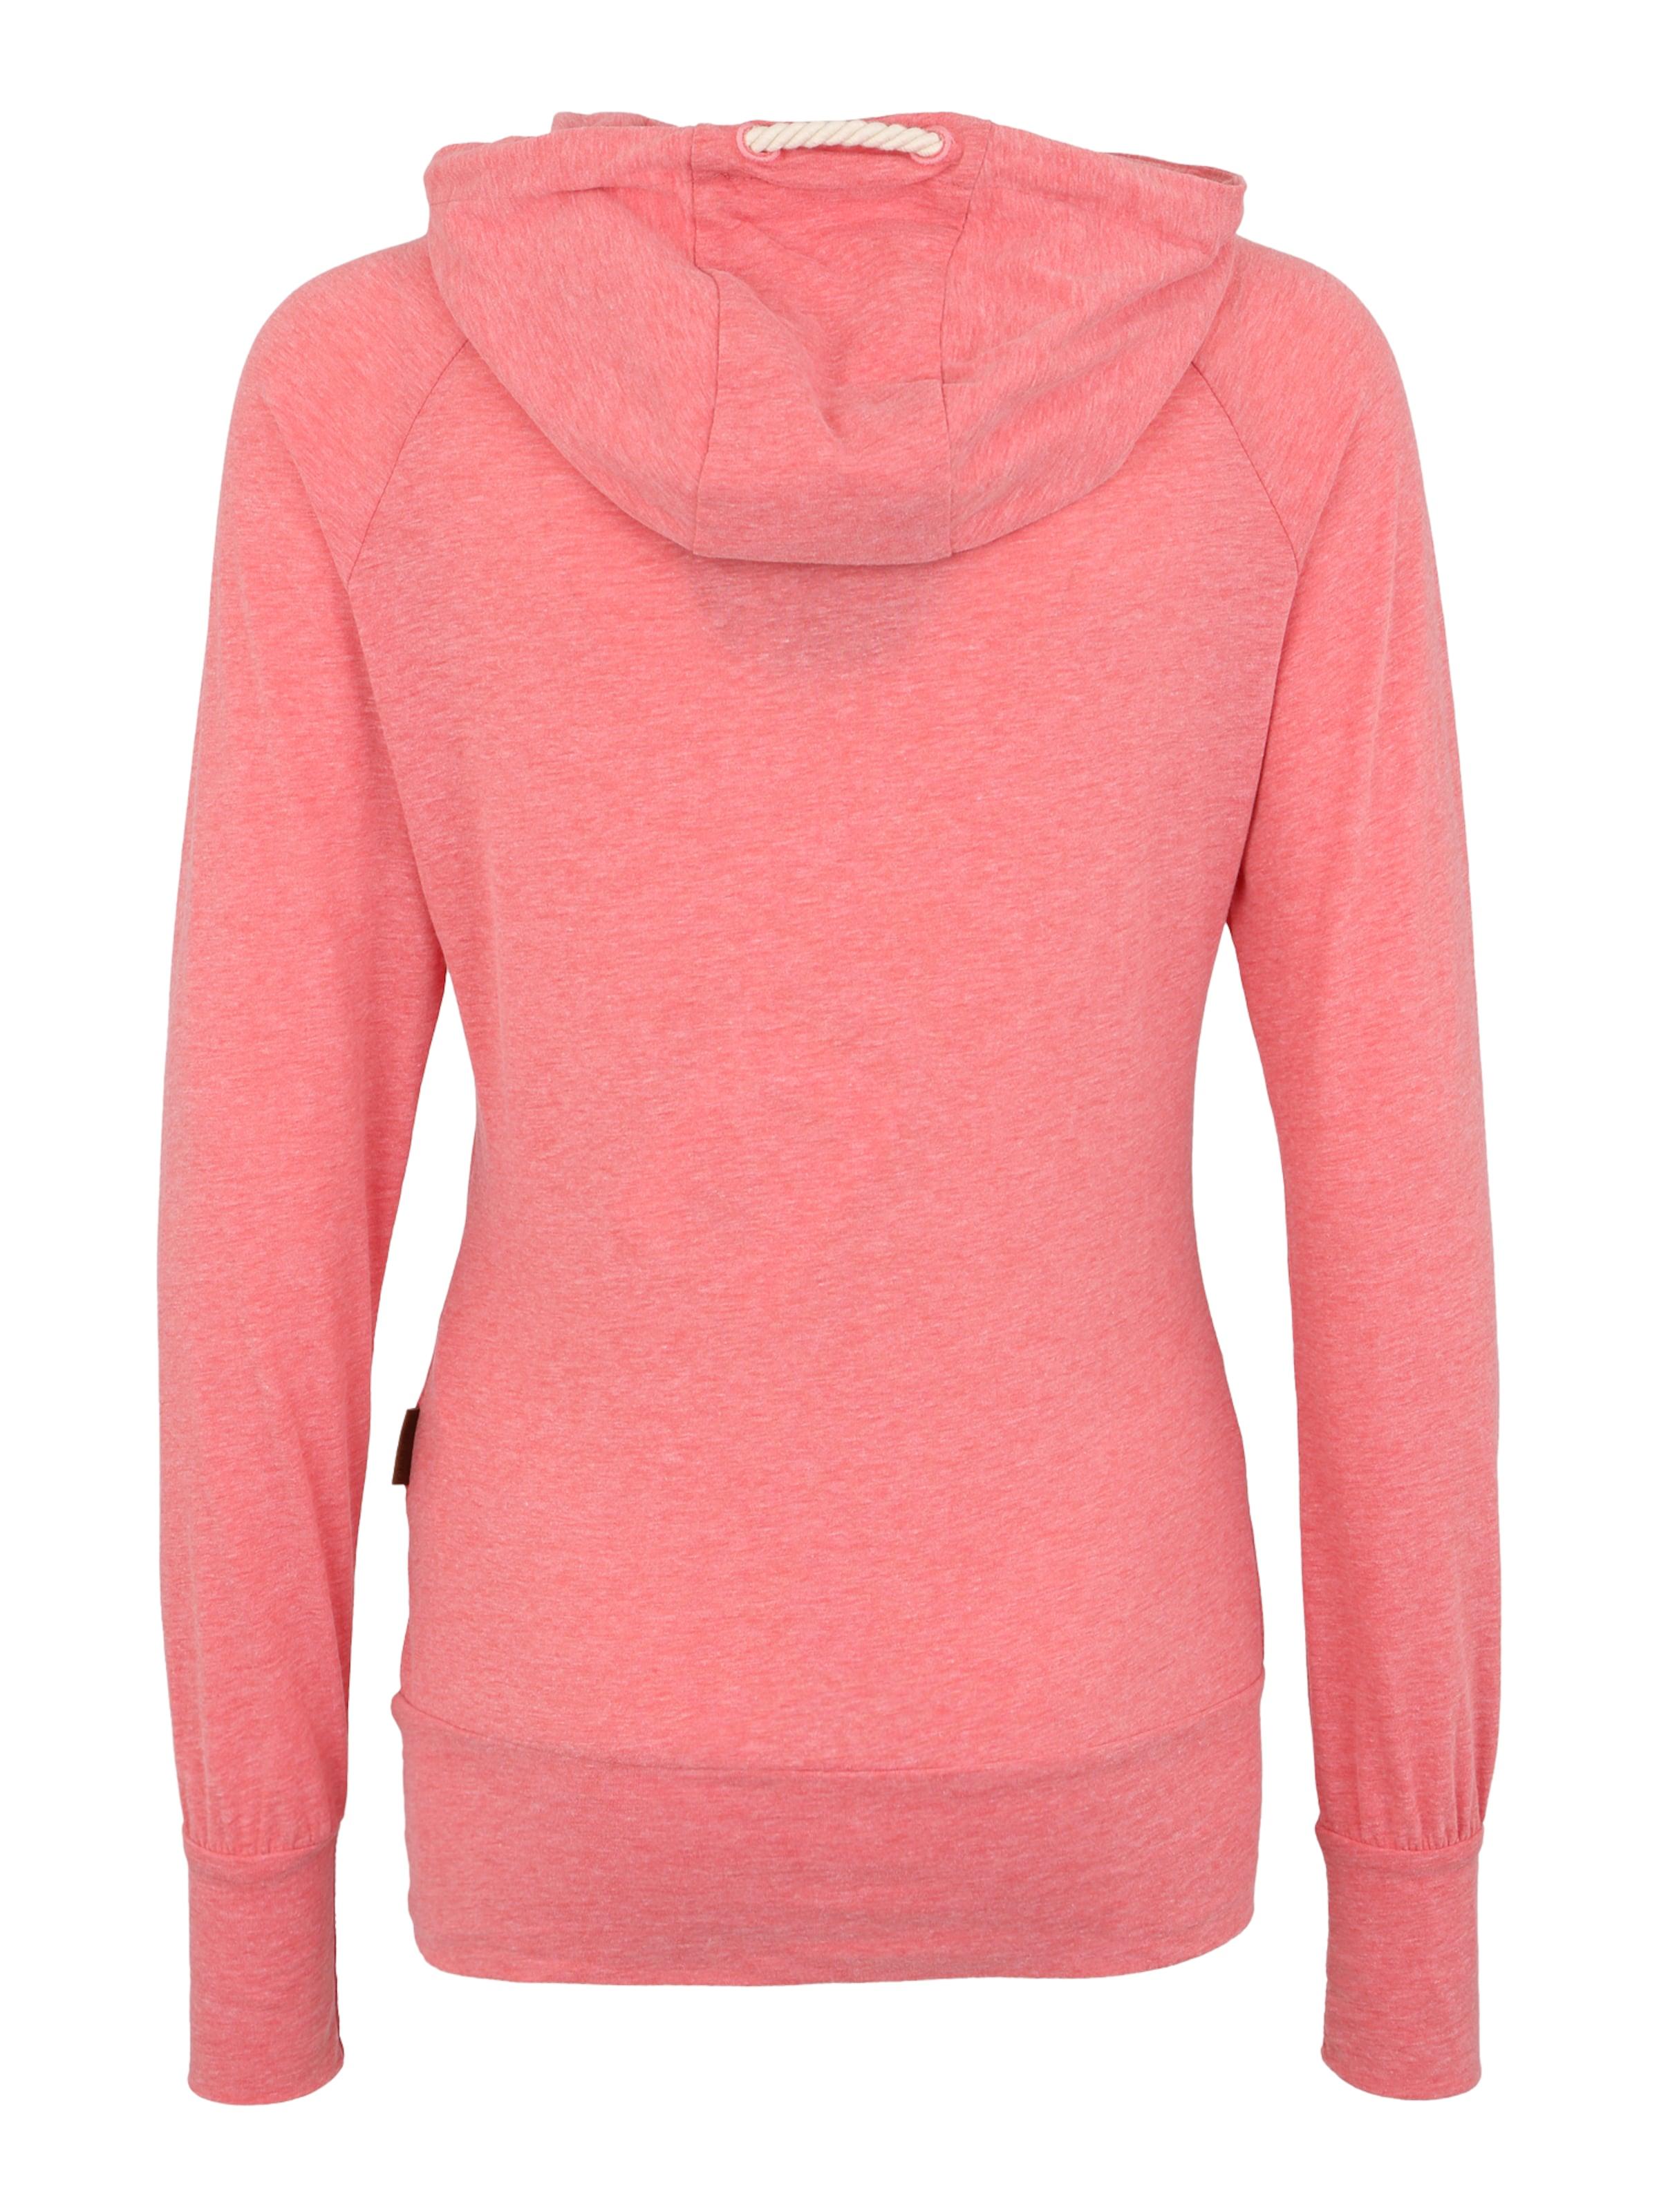 Rose 'mandy' En Naketano Sweat shirt Clair cTKFl1J